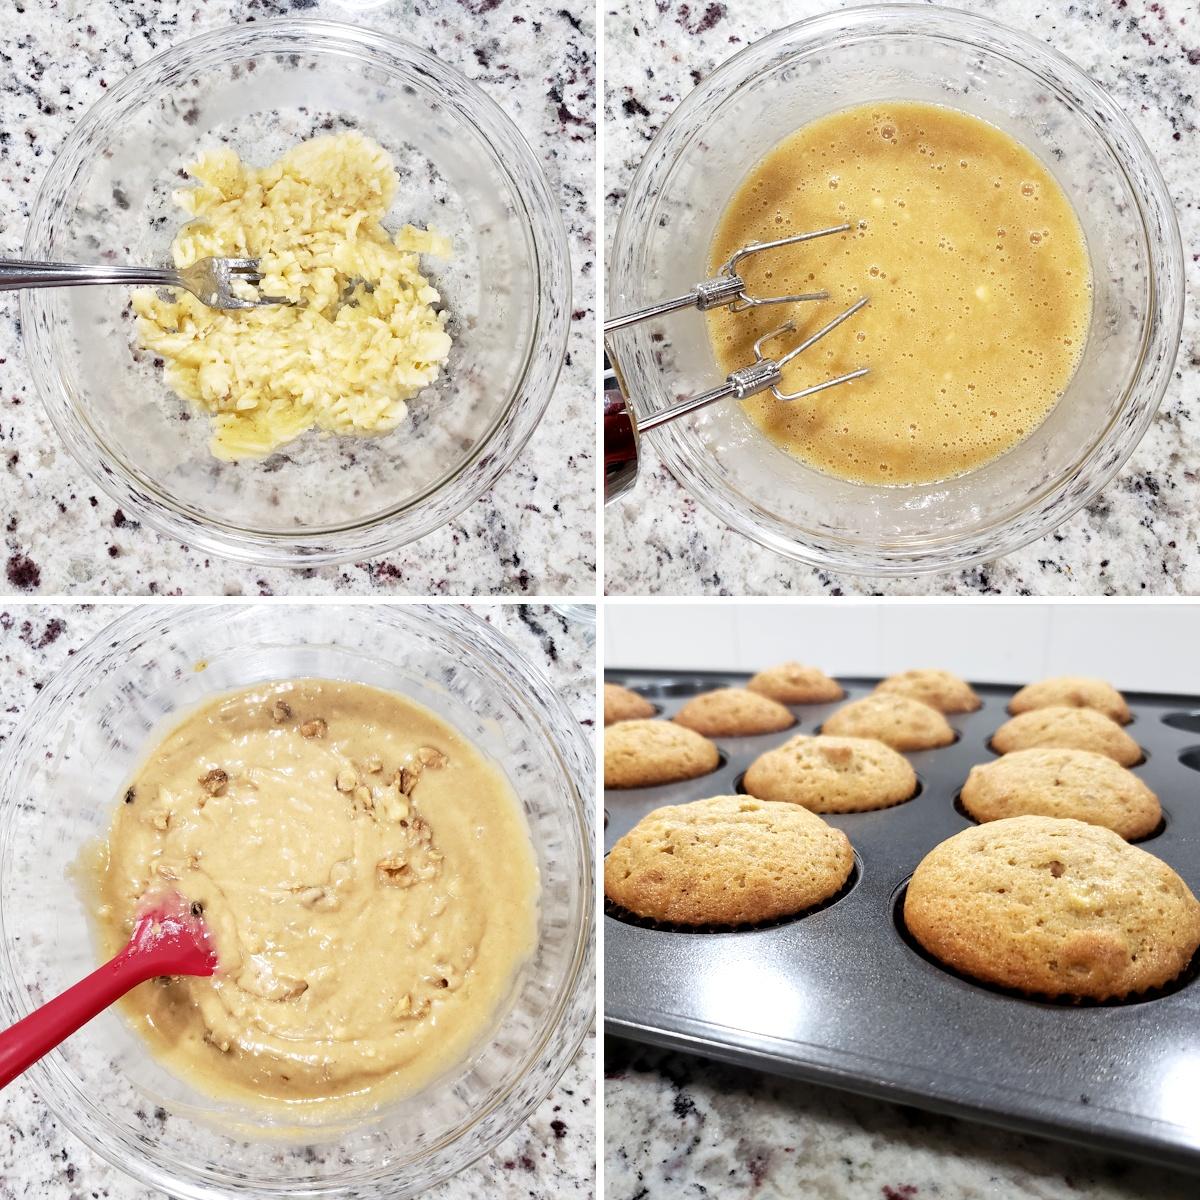 Mixing banana nut muffin batter.